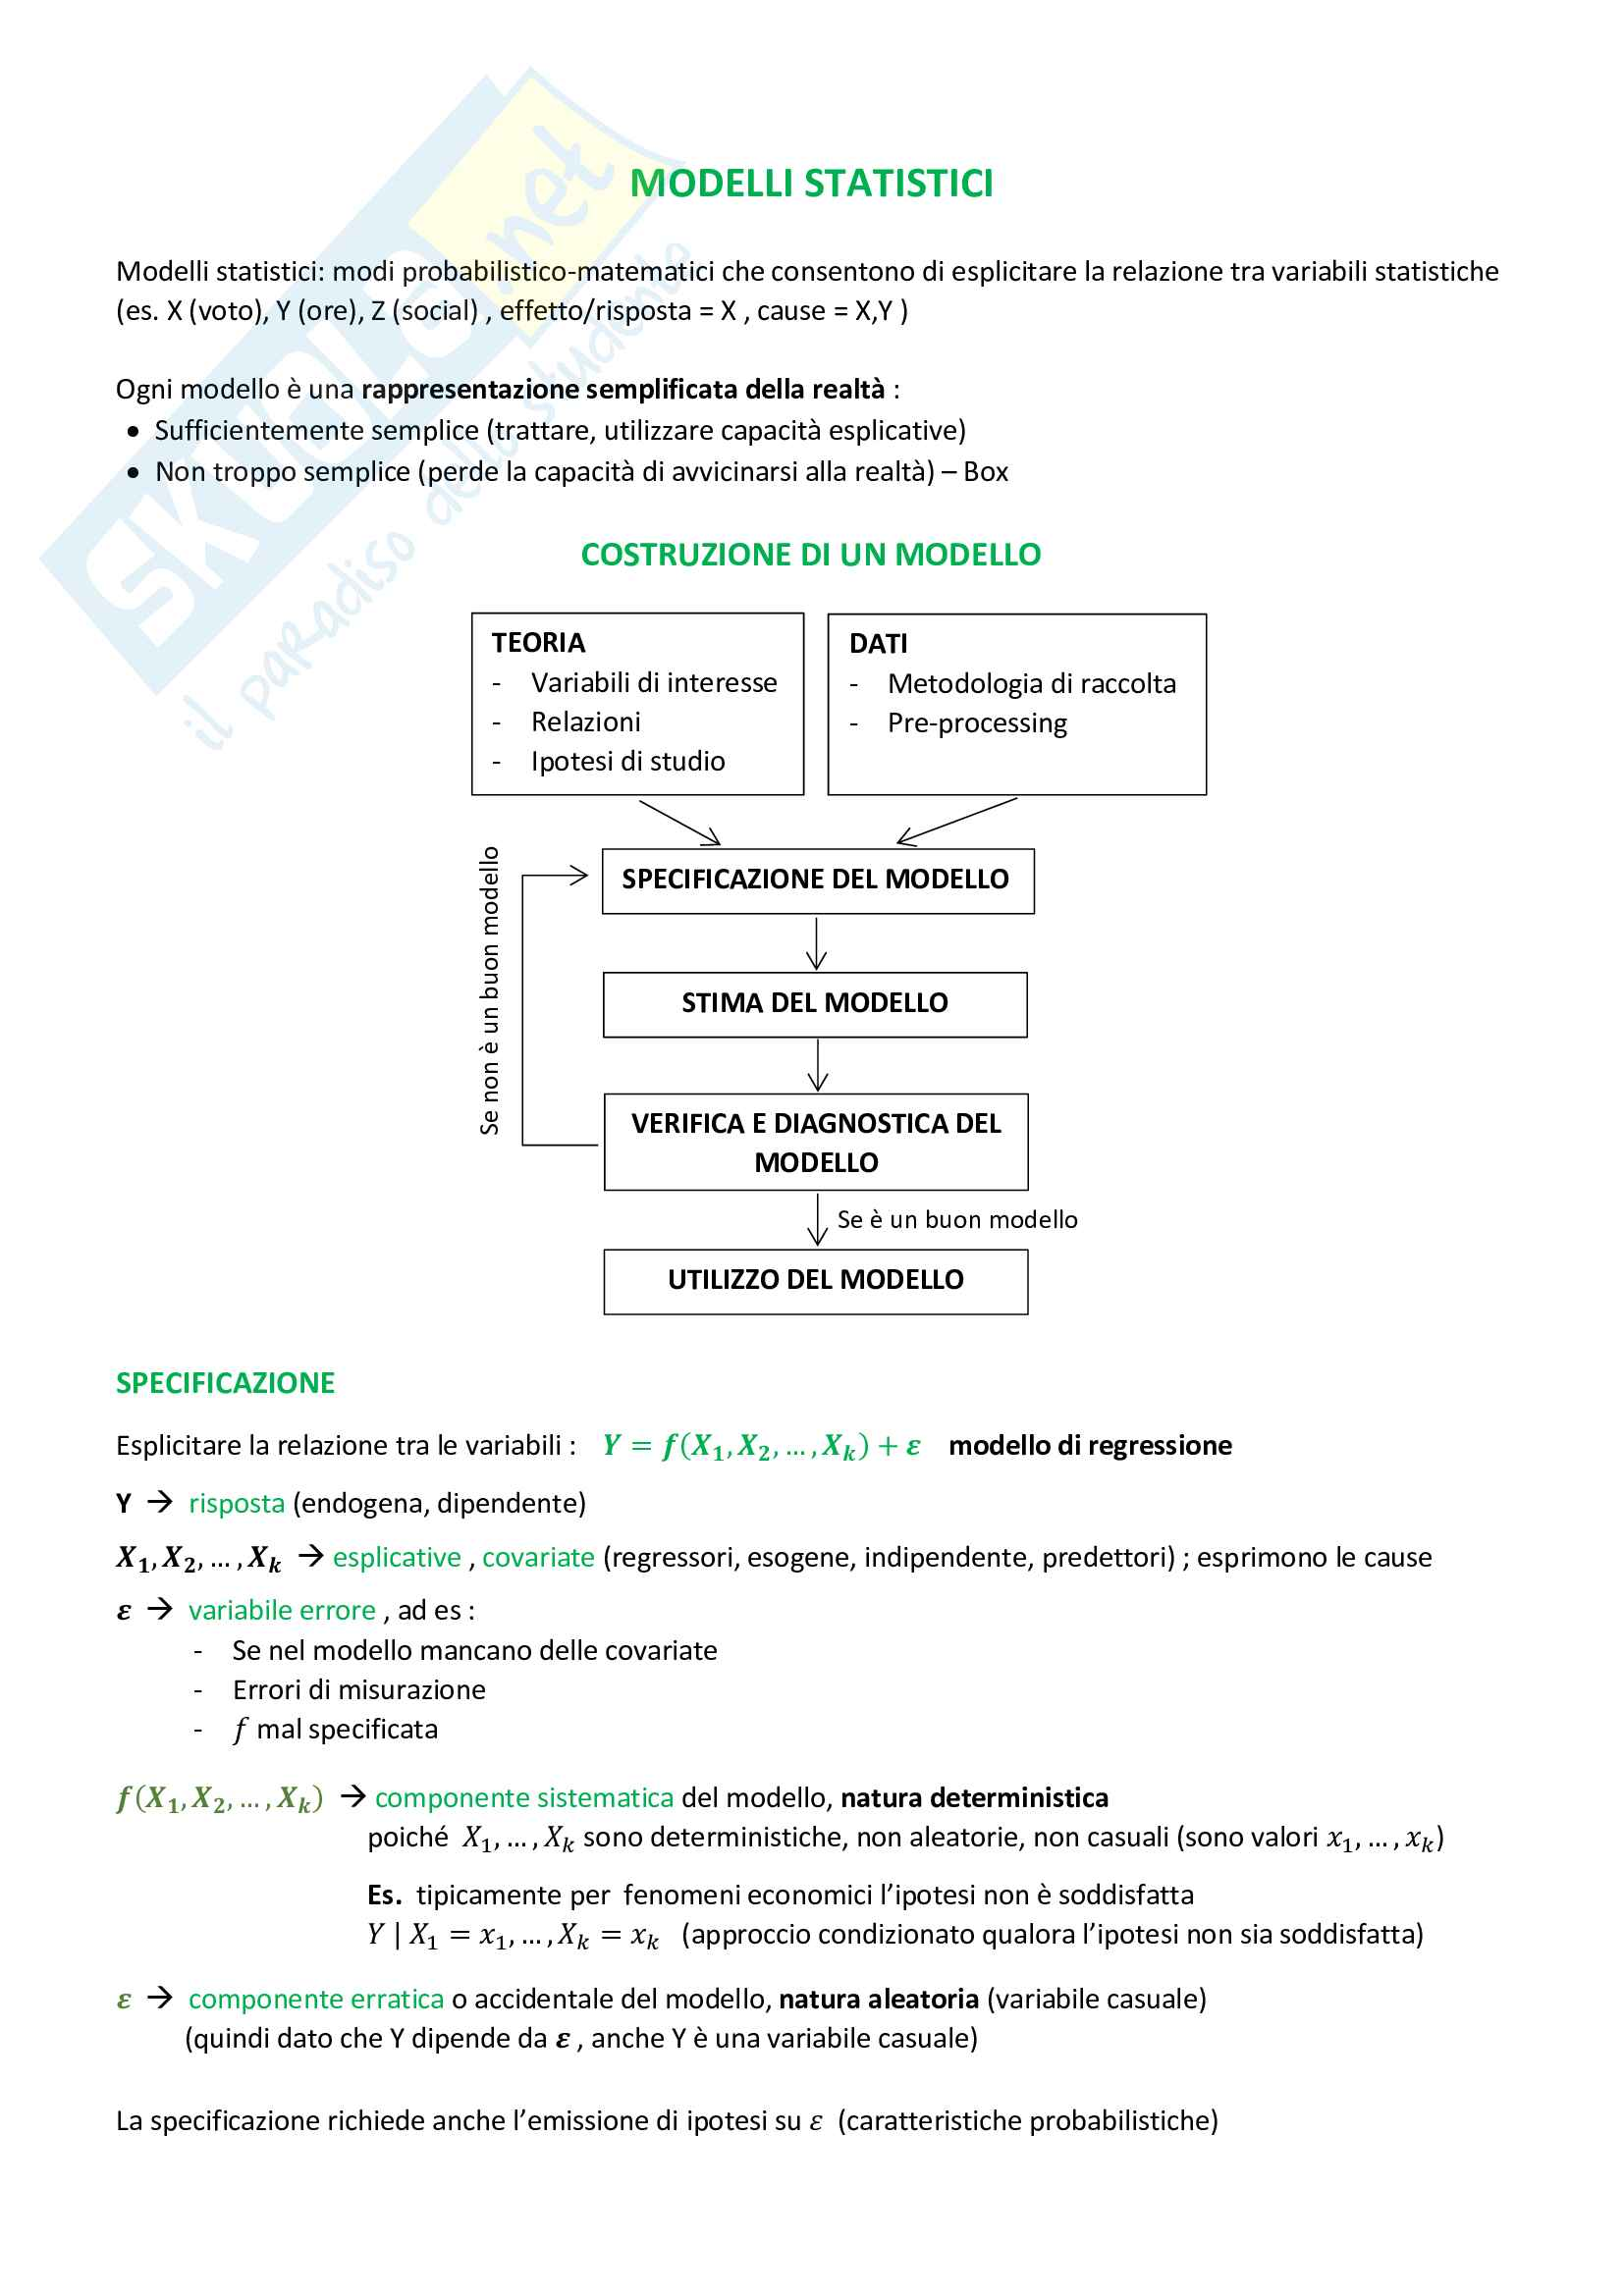 Appunti Modelli - Analisi statistica multivariata - teoria